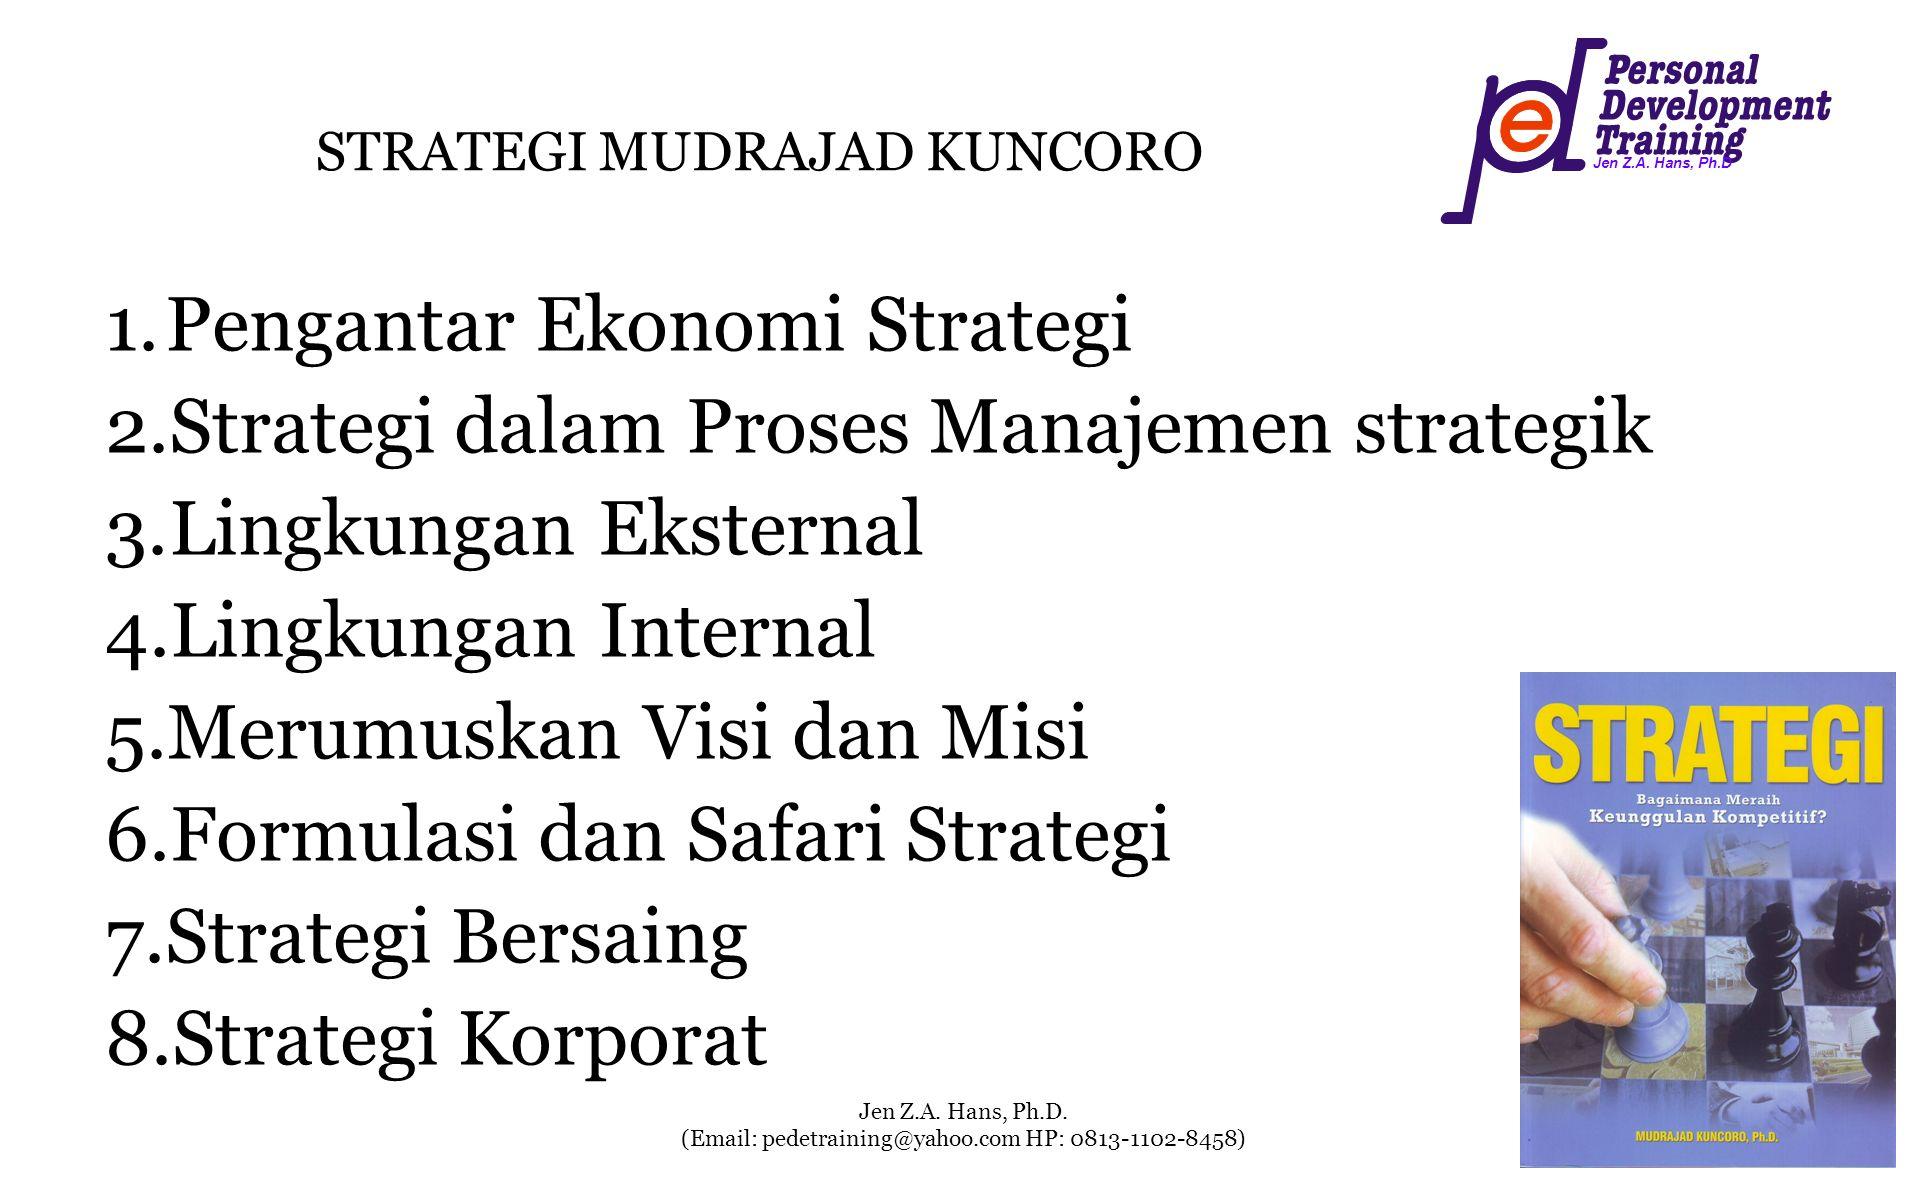 Jen Z.A. Hans, Ph.D Jen Z.A. Hans, Ph.D. (Email: pedetraining@yahoo.com HP: 0813-1102-8458) STRATEGI MUDRAJAD KUNCORO 1.Pengantar Ekonomi Strategi 2.S